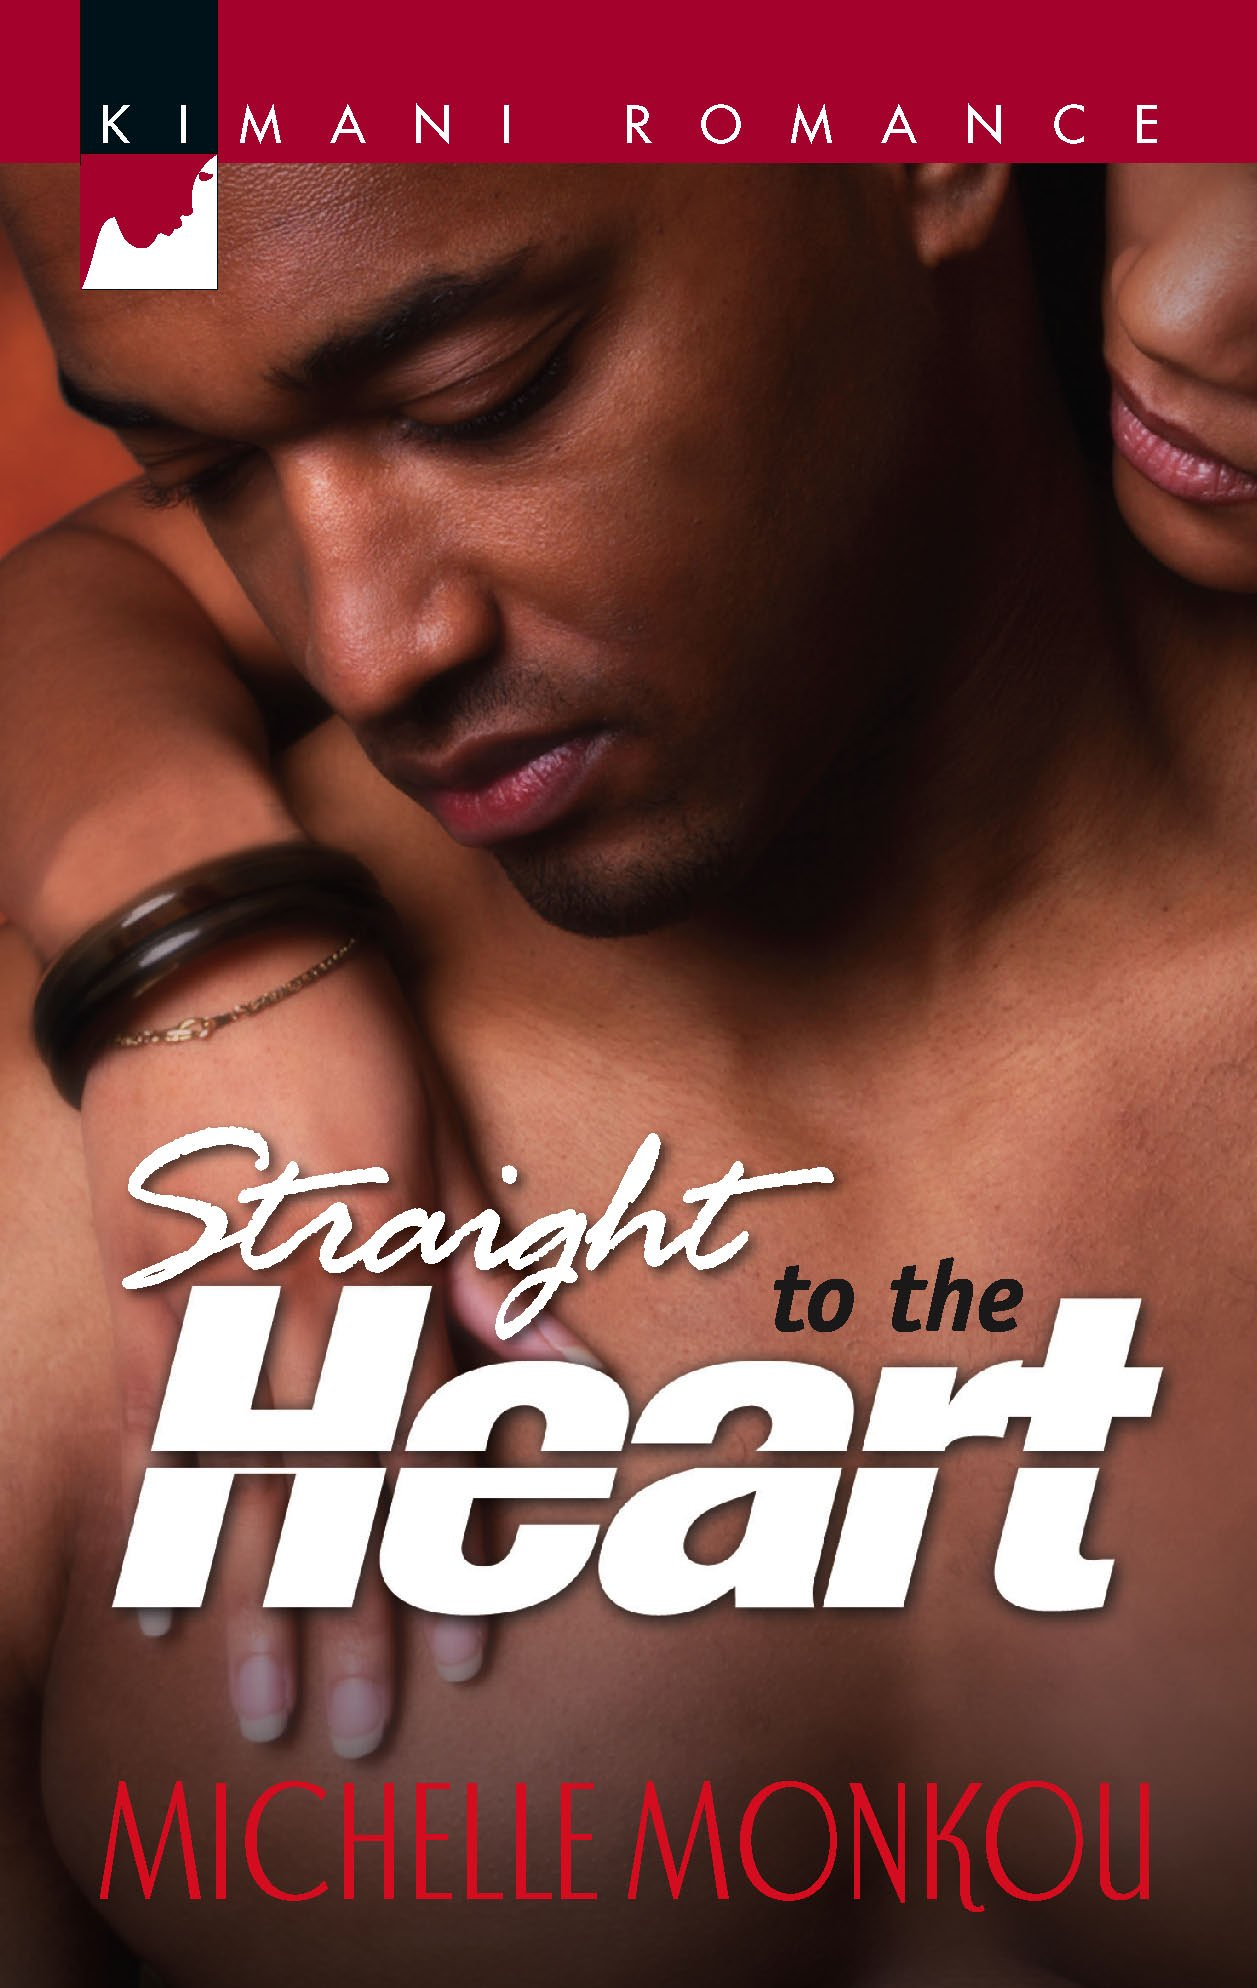 Straight To The Heart (Kimani Romance Series): Michelle Monkou:  9780373860340: Amazon.com: Books